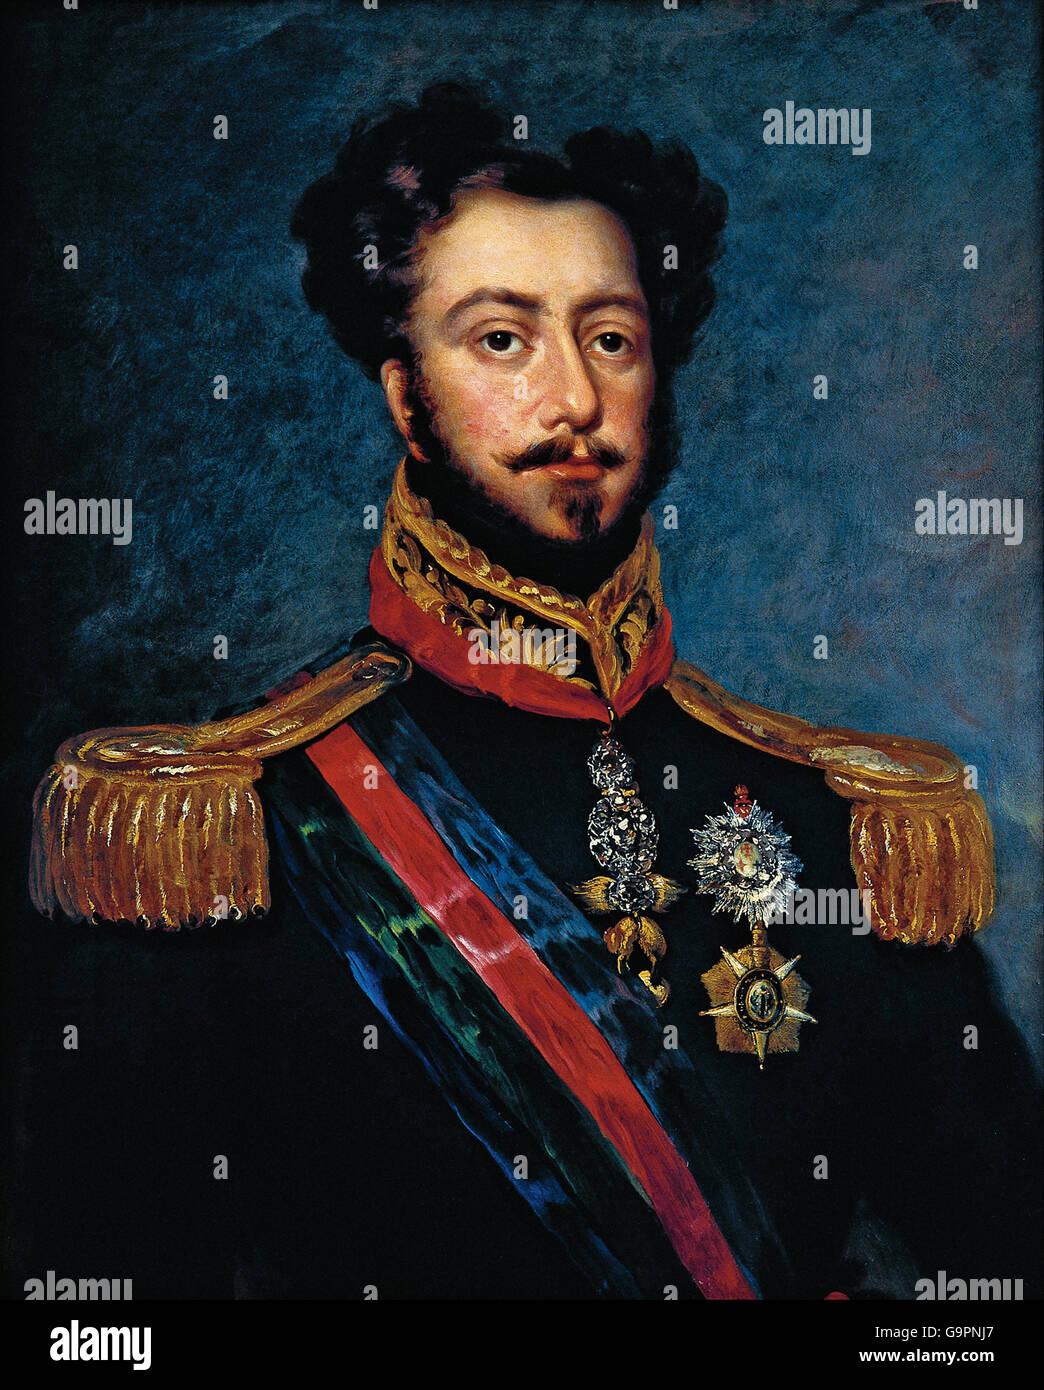 Portrait of Dom Pedro, Duke of Bragança edited - Stock Image